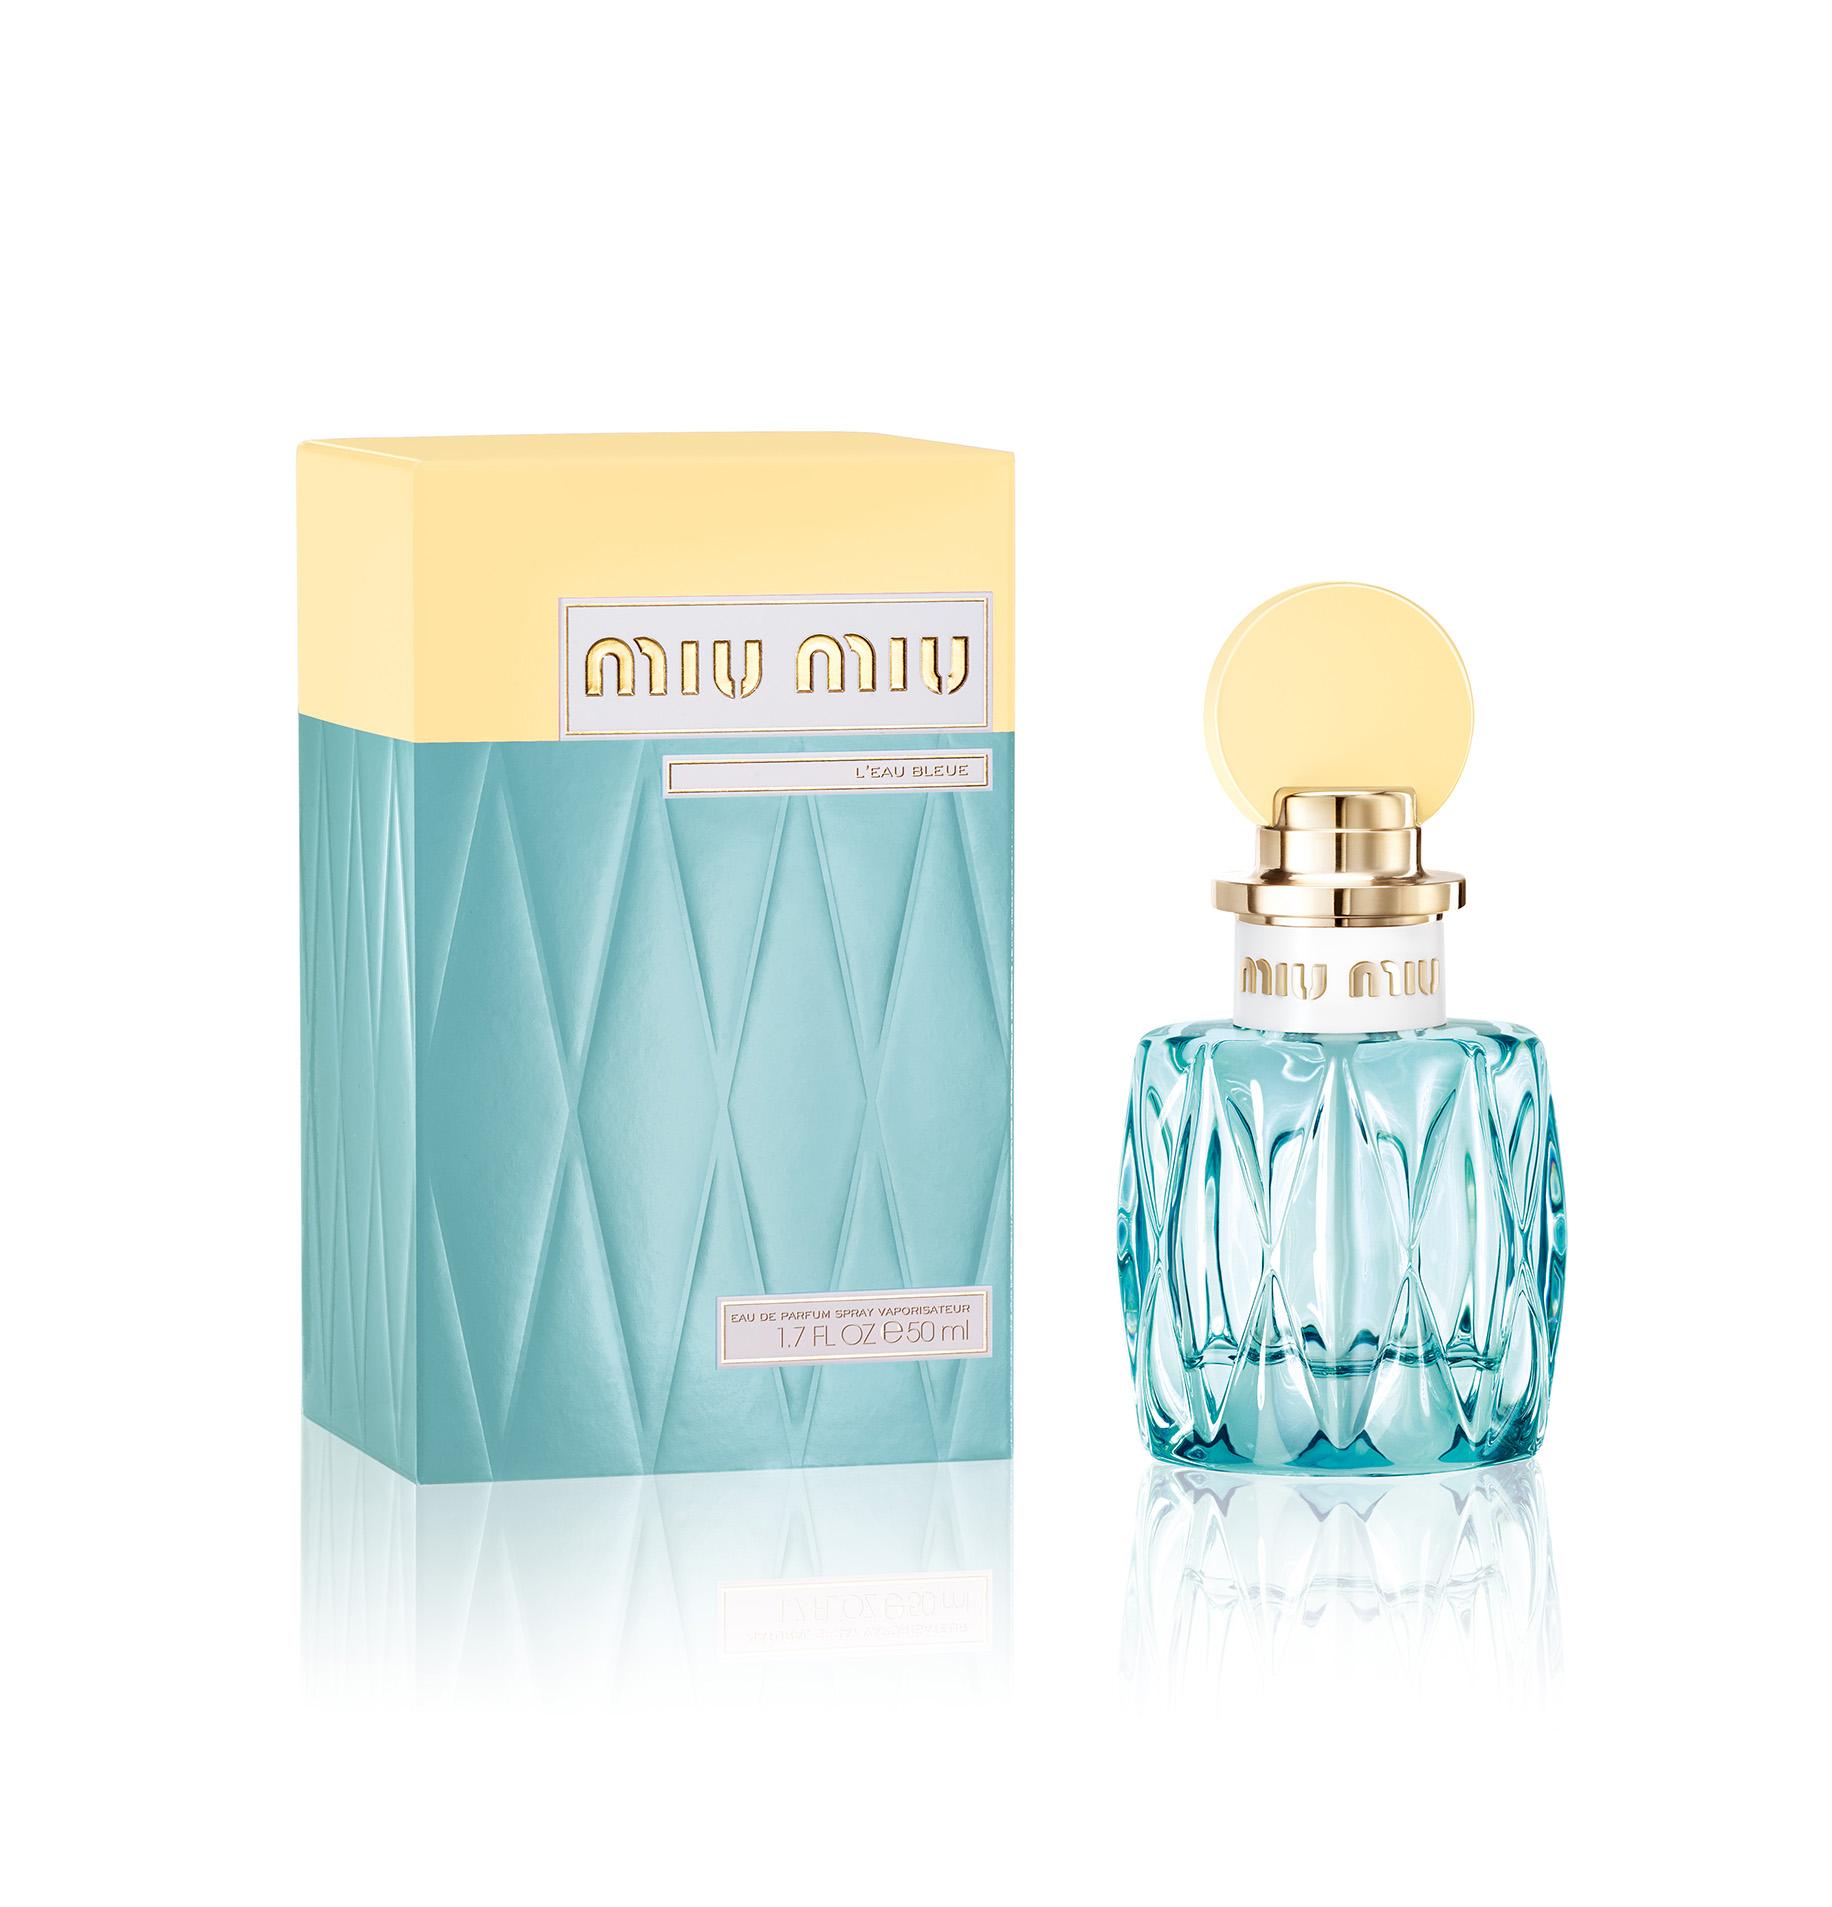 32eea0b71e4 Miu Miu L Eau Bleue eau de parfum will be available for  90 (1.7oz) at  Sephora in February.